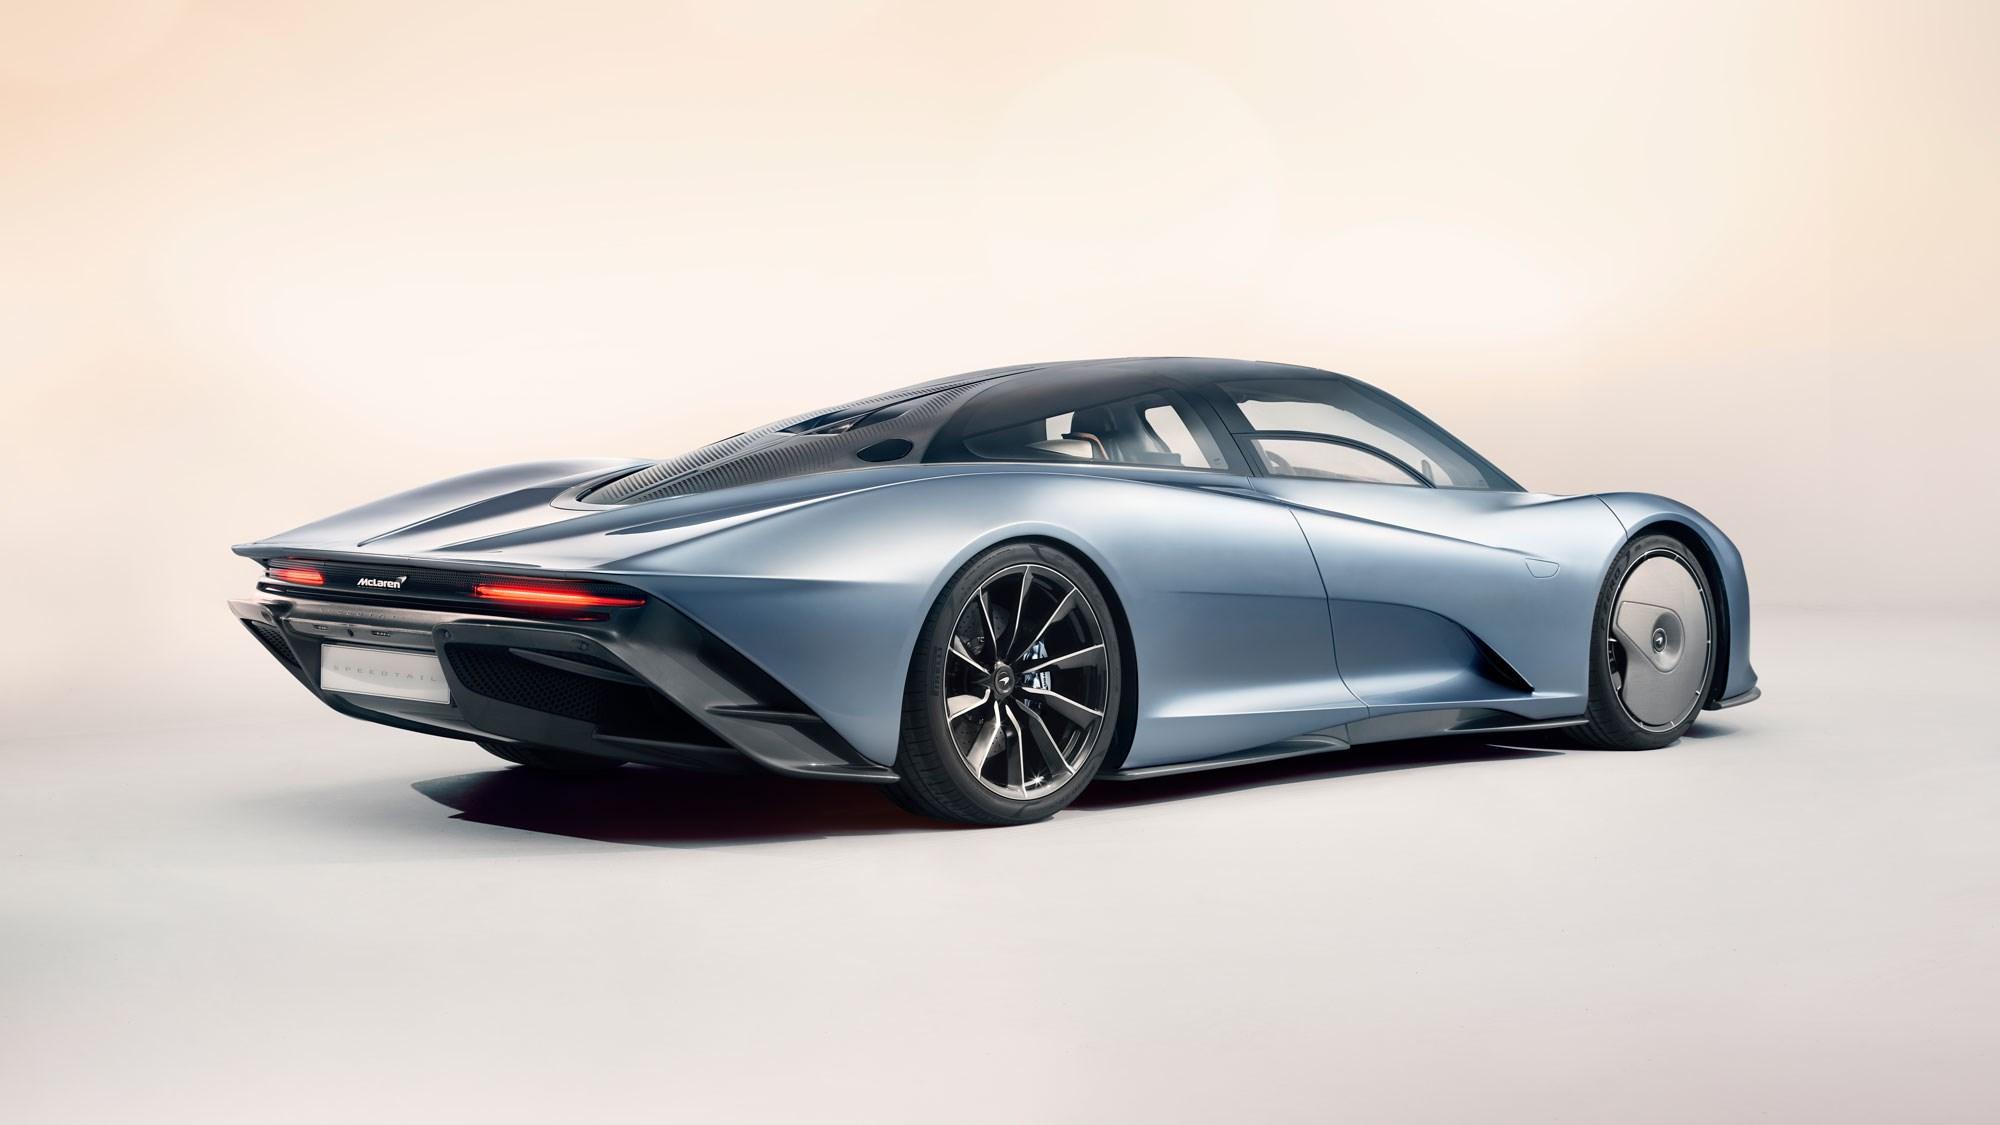 mclaren speedtail: hypercar makes 309bhp from its e-motor alone